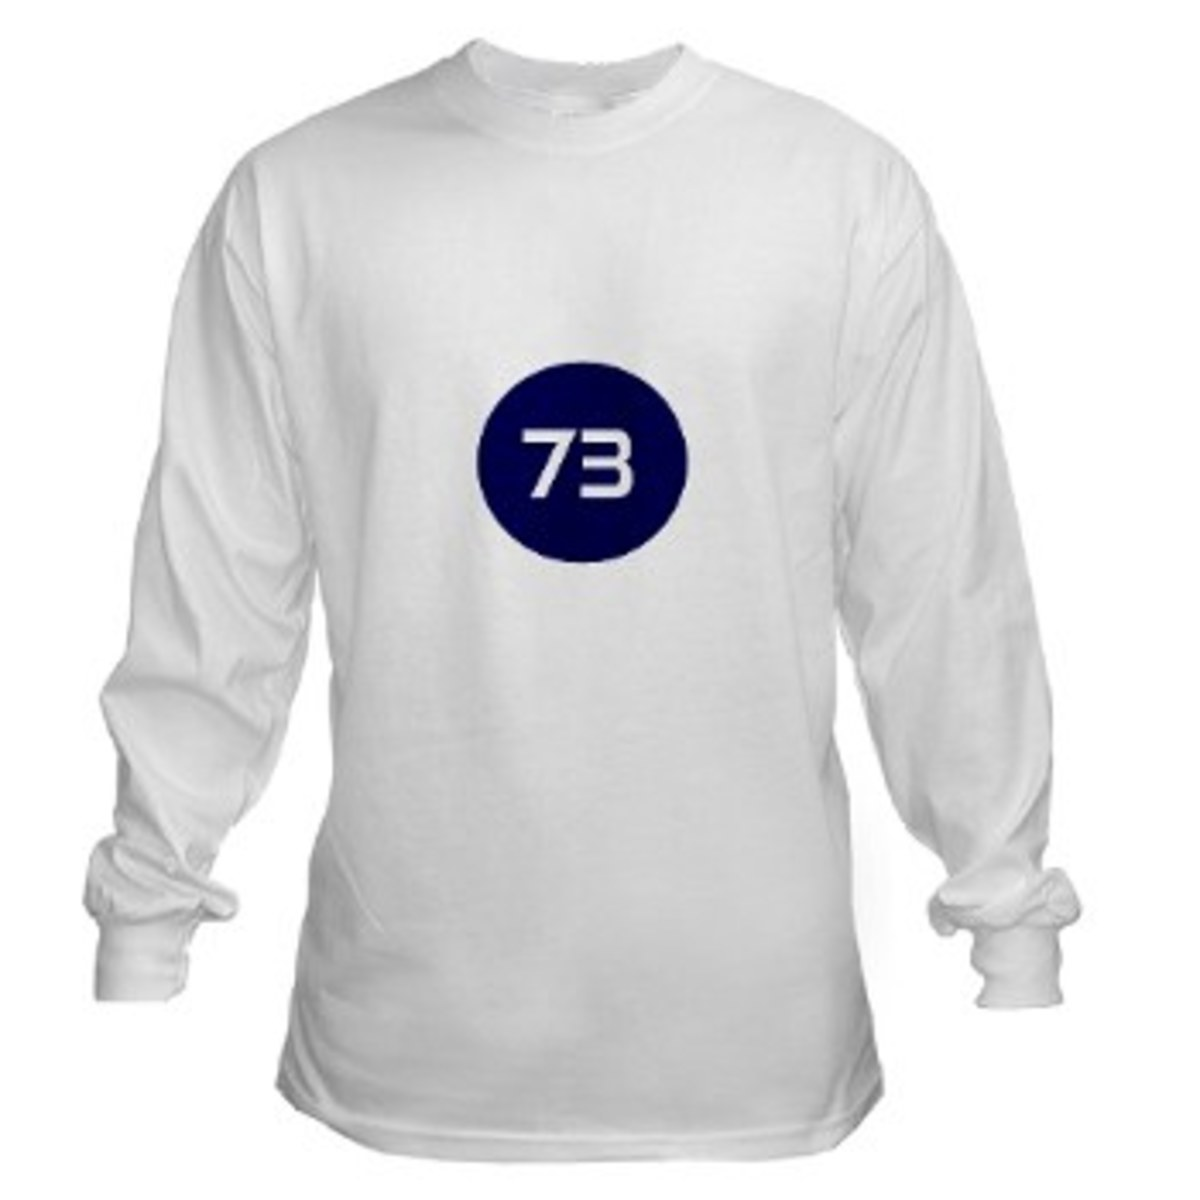 sheldons-73-shirt-73-on-sheldons-shirt